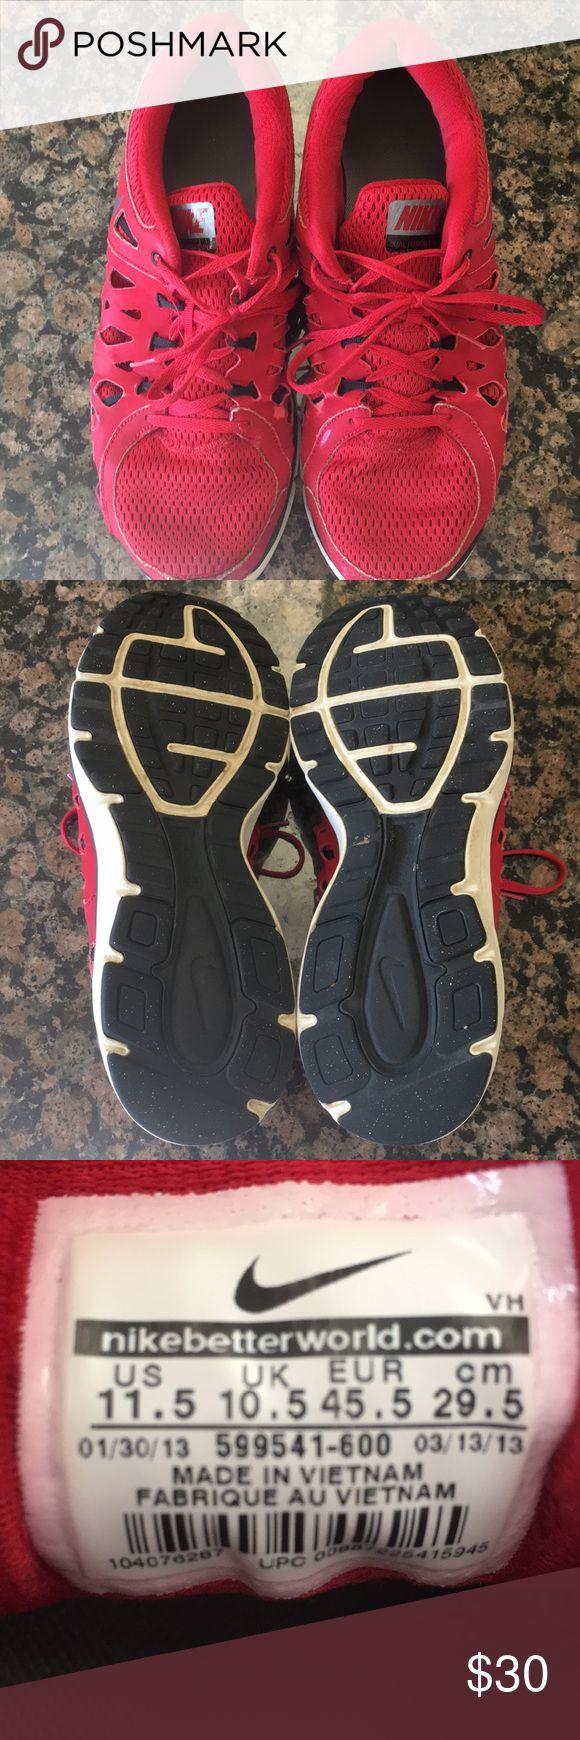 🔥 NIKE DUAL FUSION 2 RUNNING SHOES 🔥 2014 MEN'S 11.5 NIKE DUAL FUSION 2 RUNNING SHOES. Pre owned in pristine shape. Nike Shoes Athletic Shoes